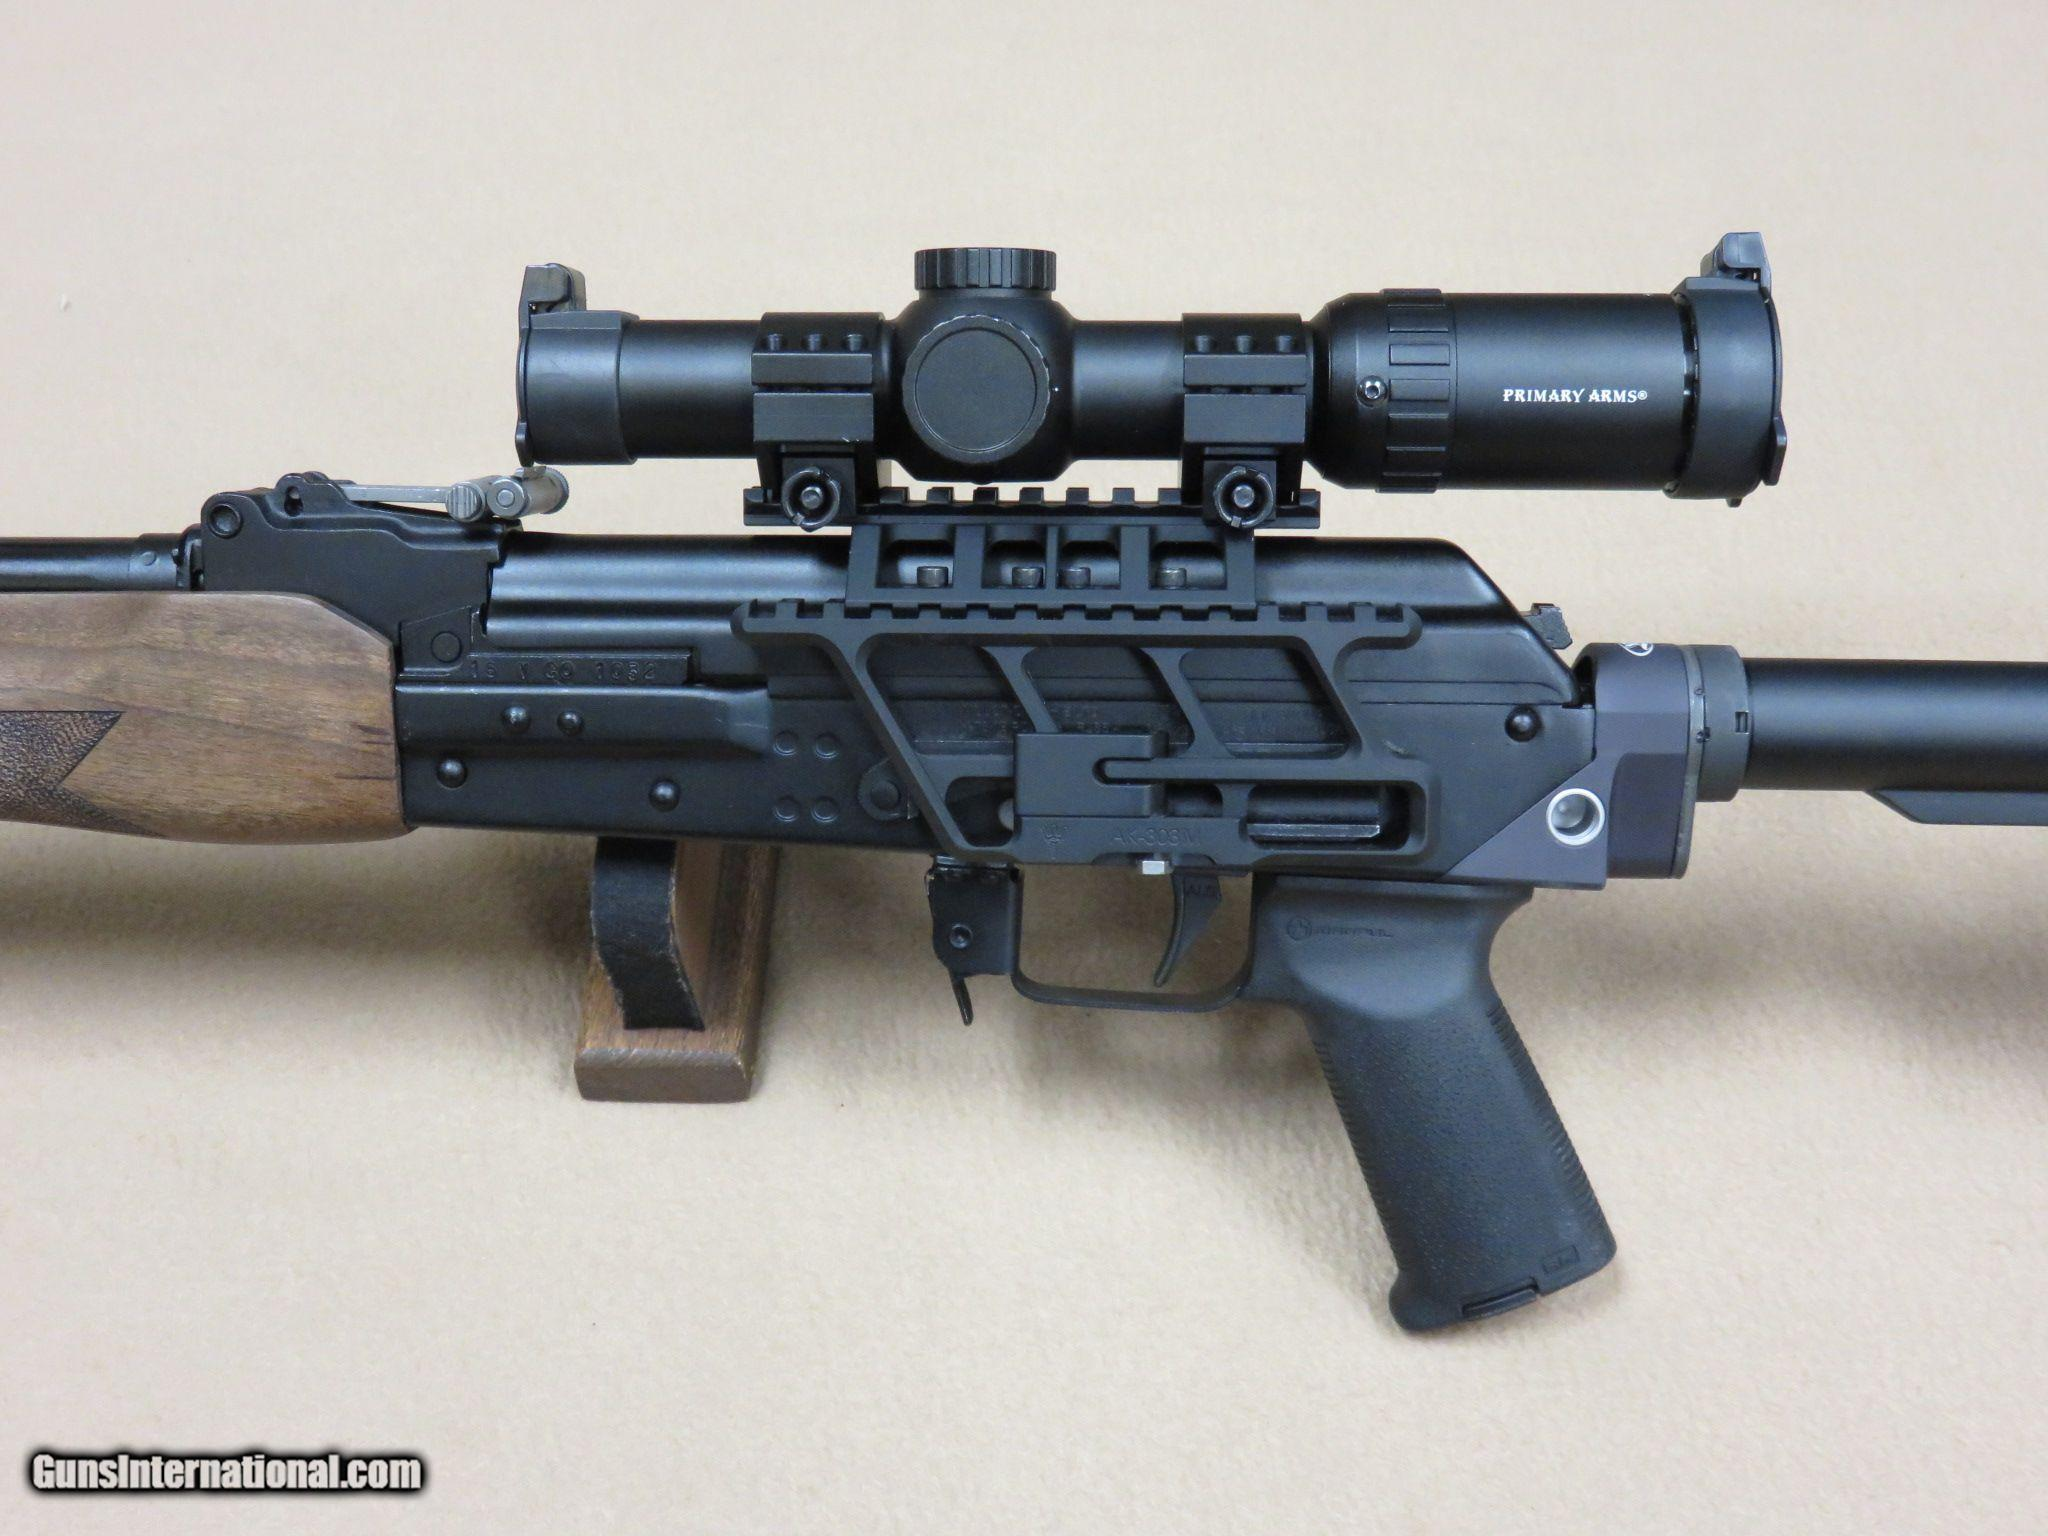 Molot VEPR AK 7 62x39 w/ Primary Arms Scope, Upgrades